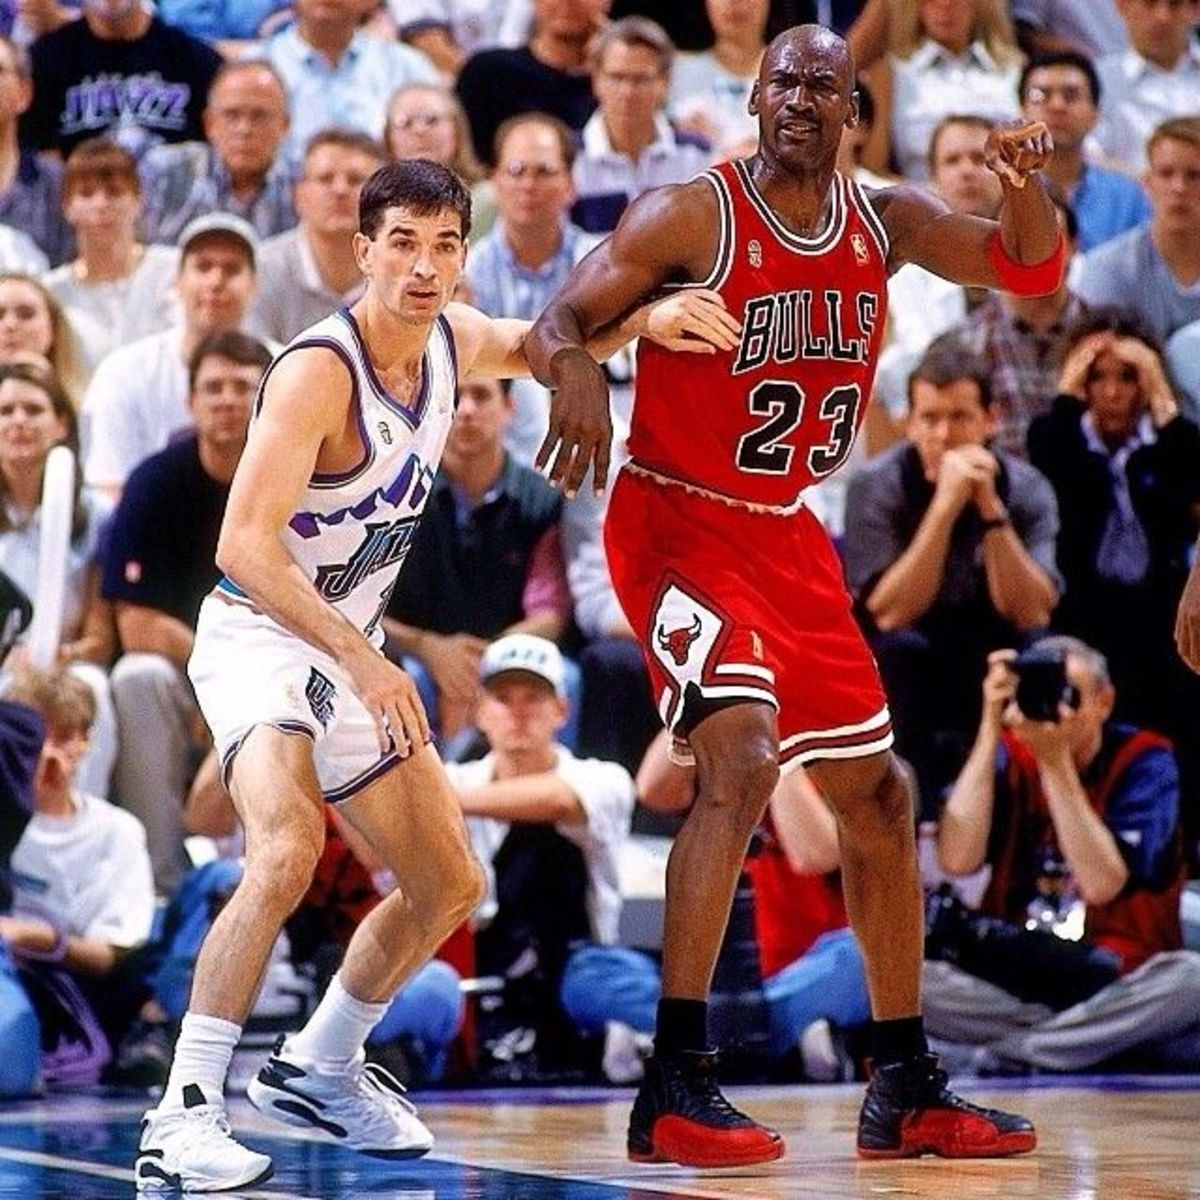 John Stockton vs. Michael Jordan